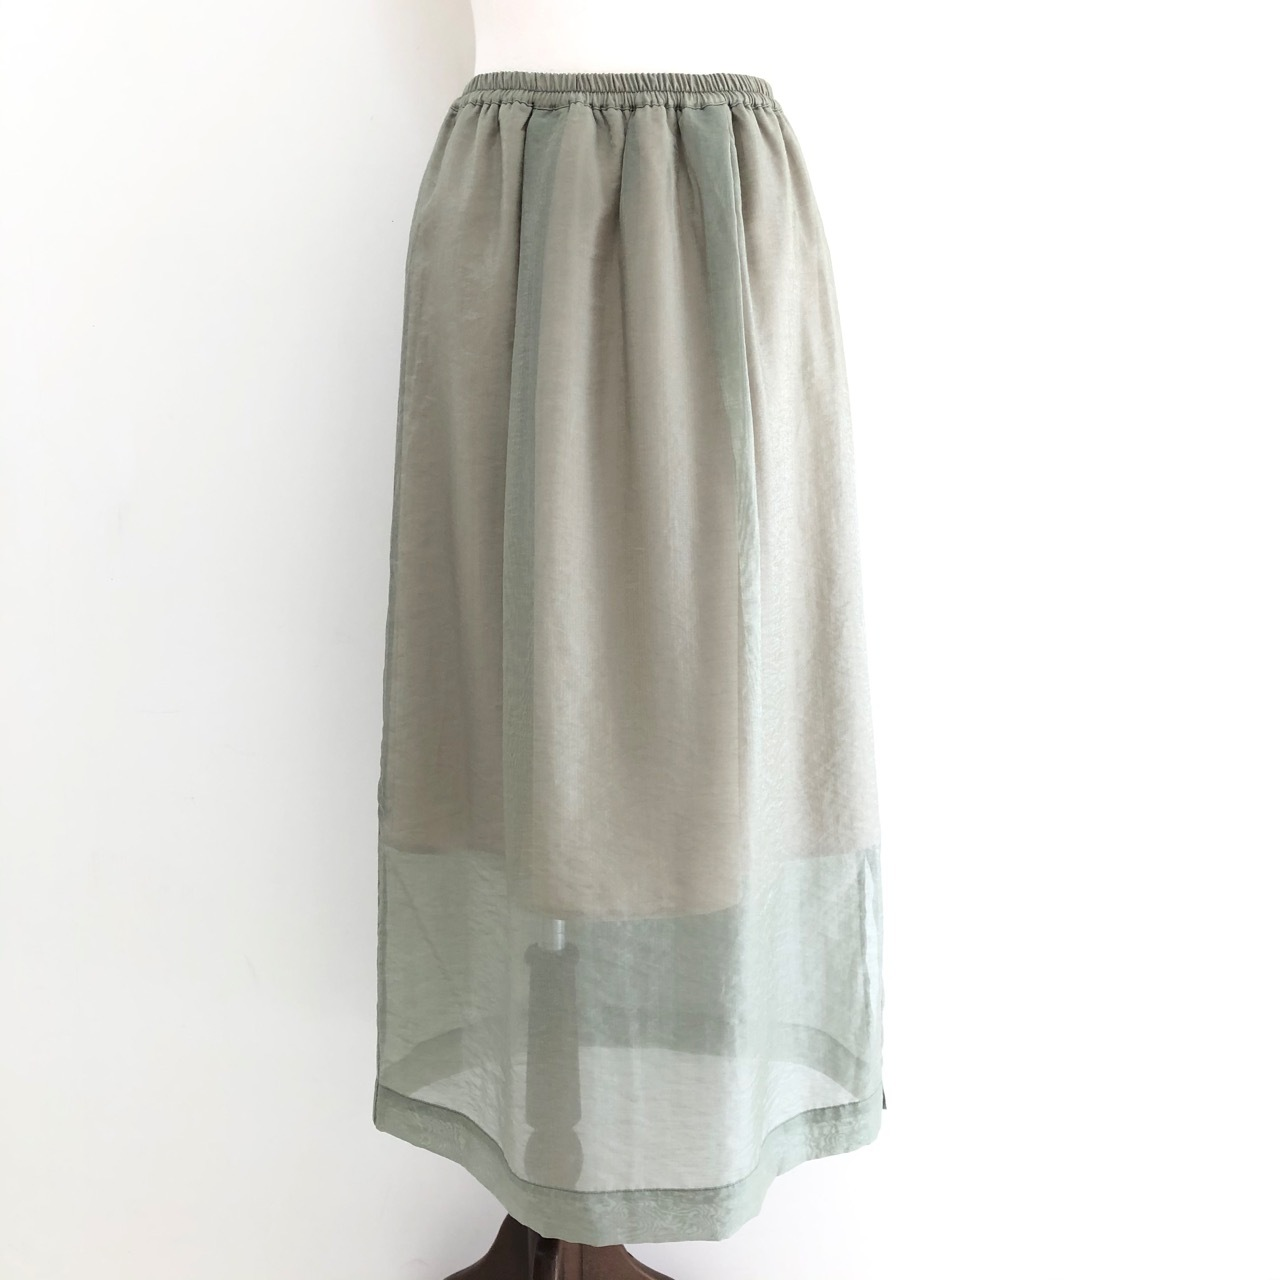 【 CHIGNONSTAR 】- 2601-251 - シアーバイカラースカート